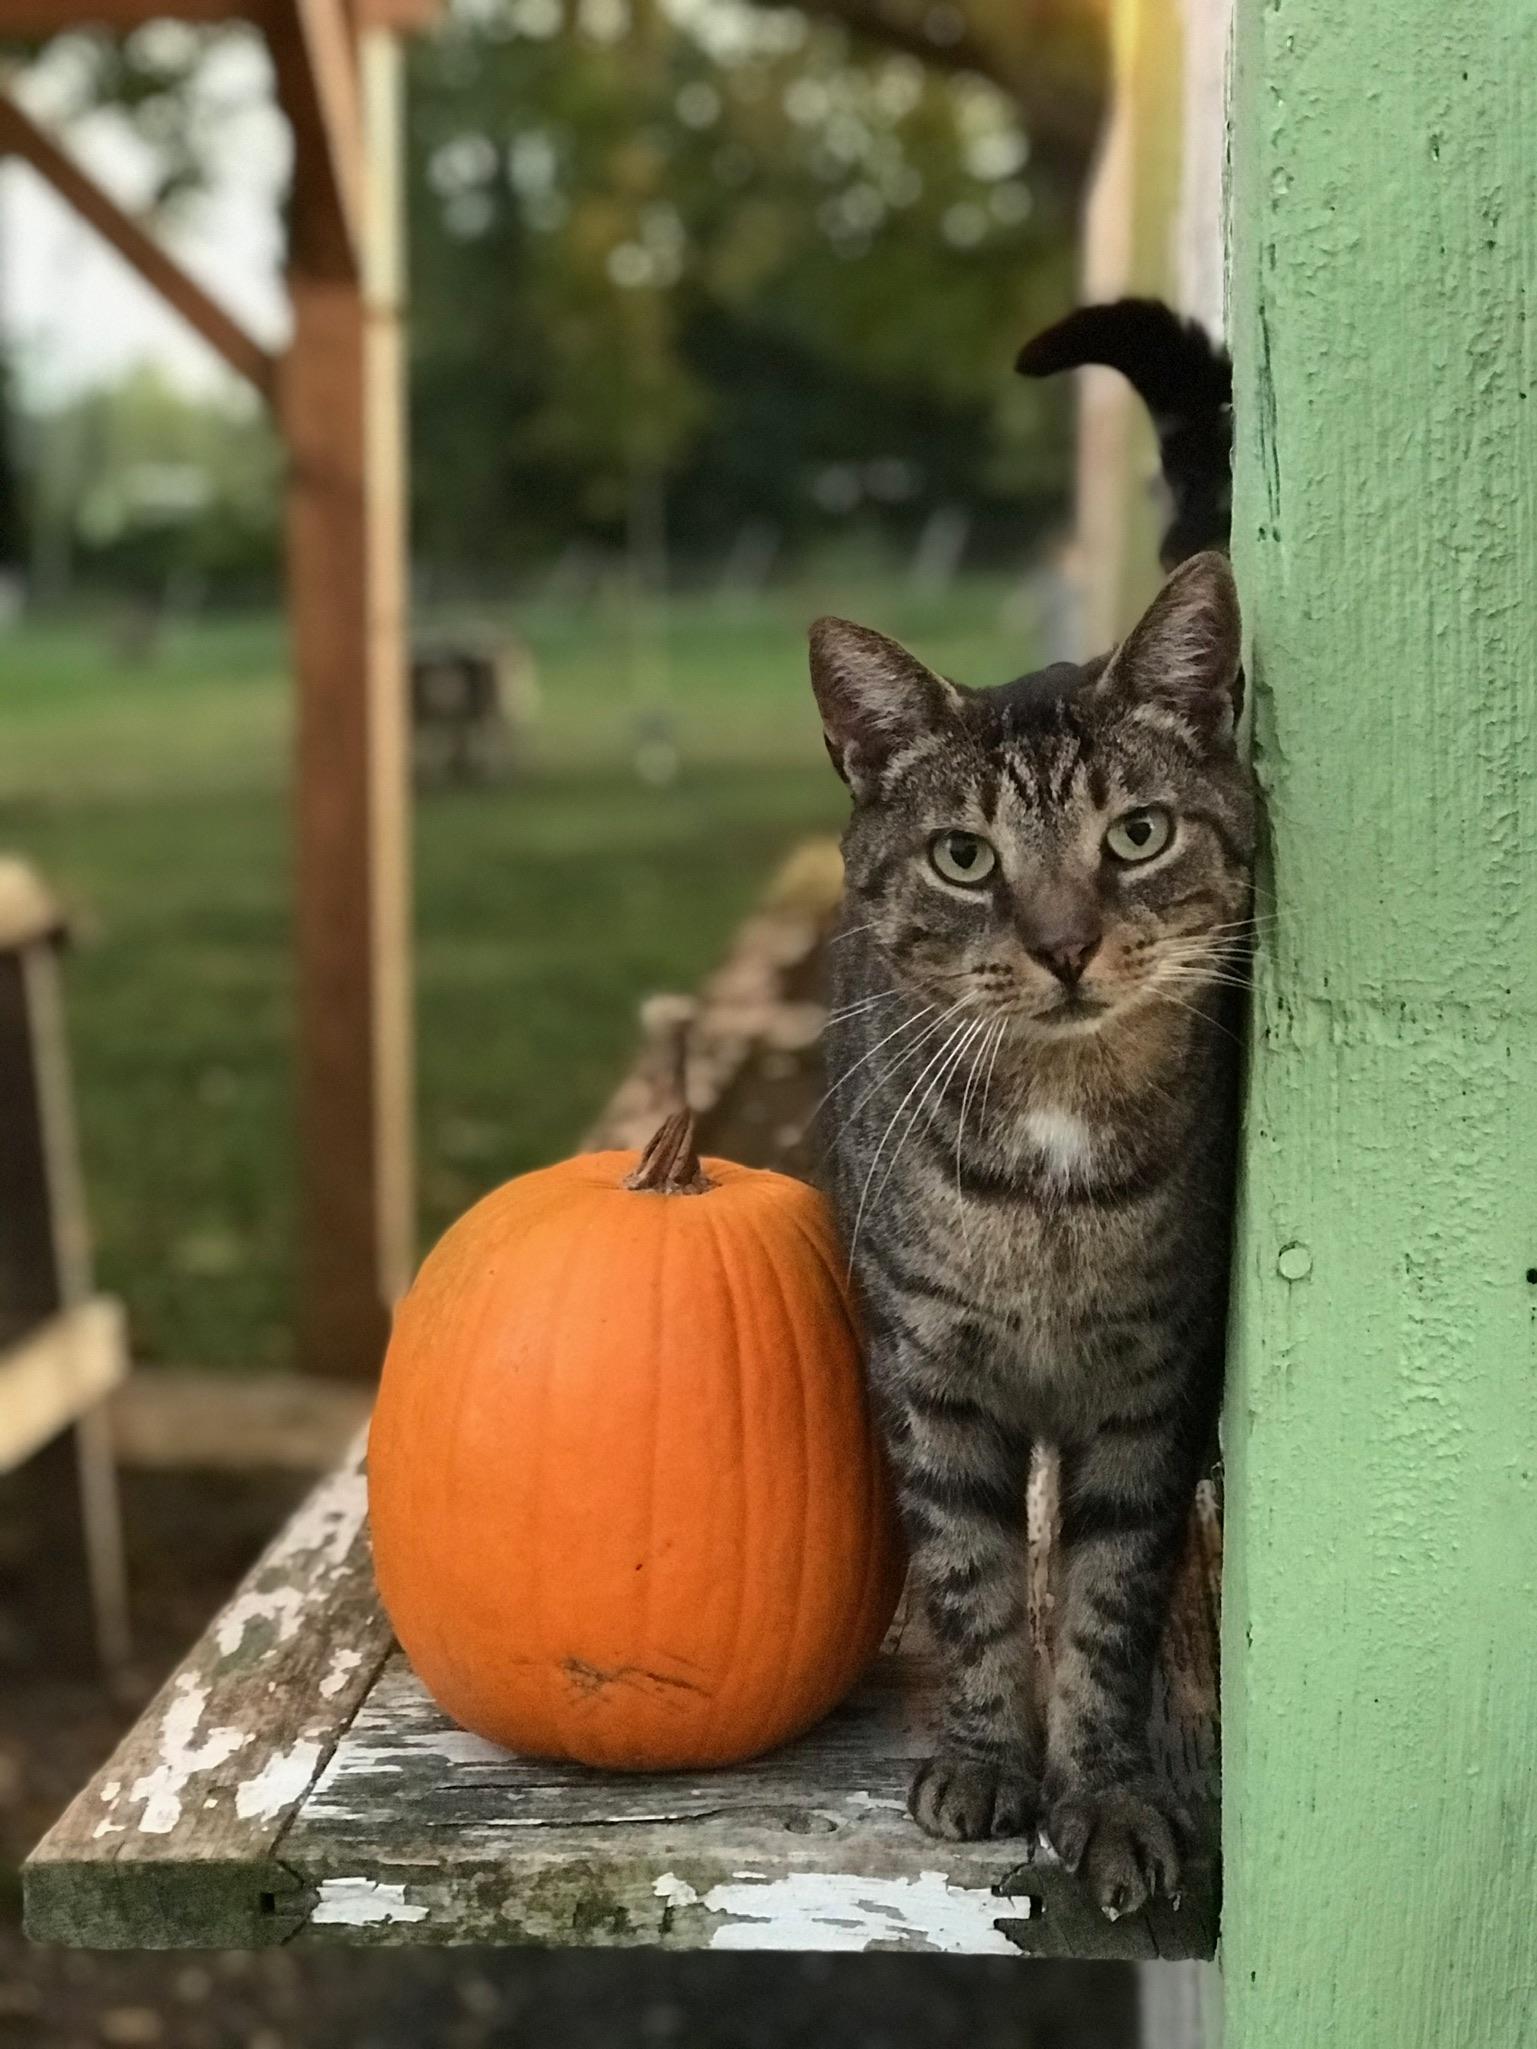 Farm Happenings for October 29, 2021